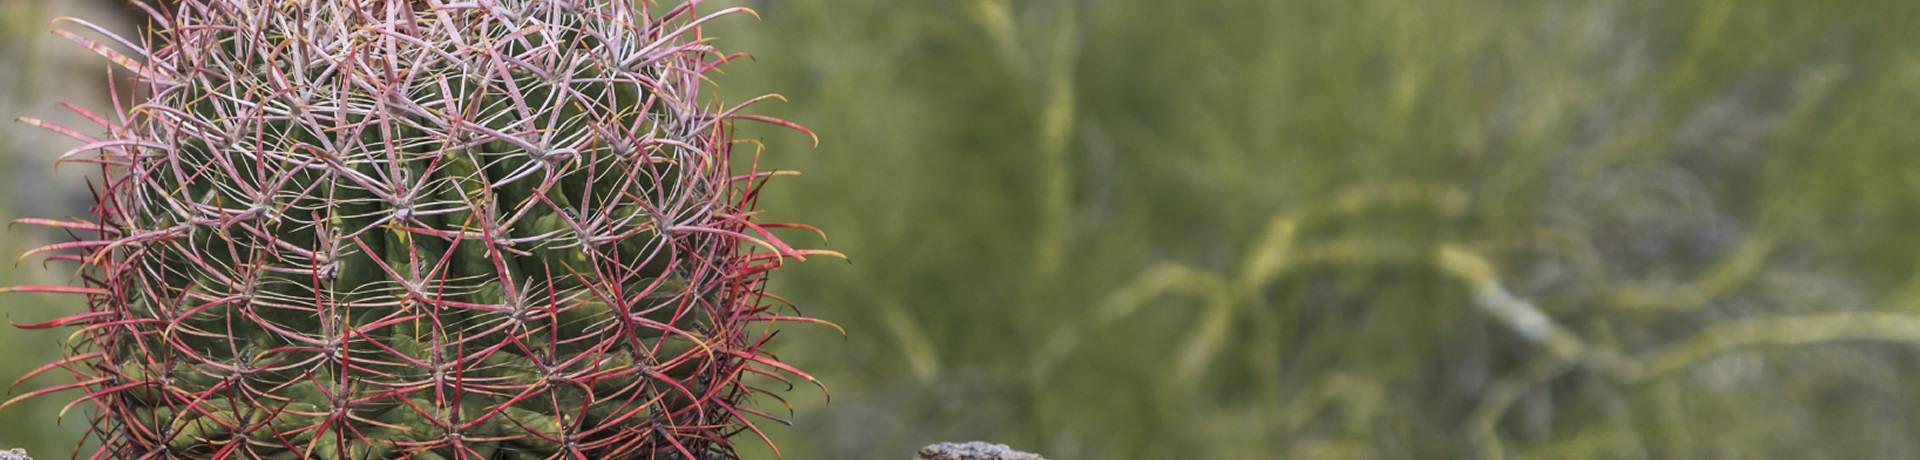 slide-cactus-wide